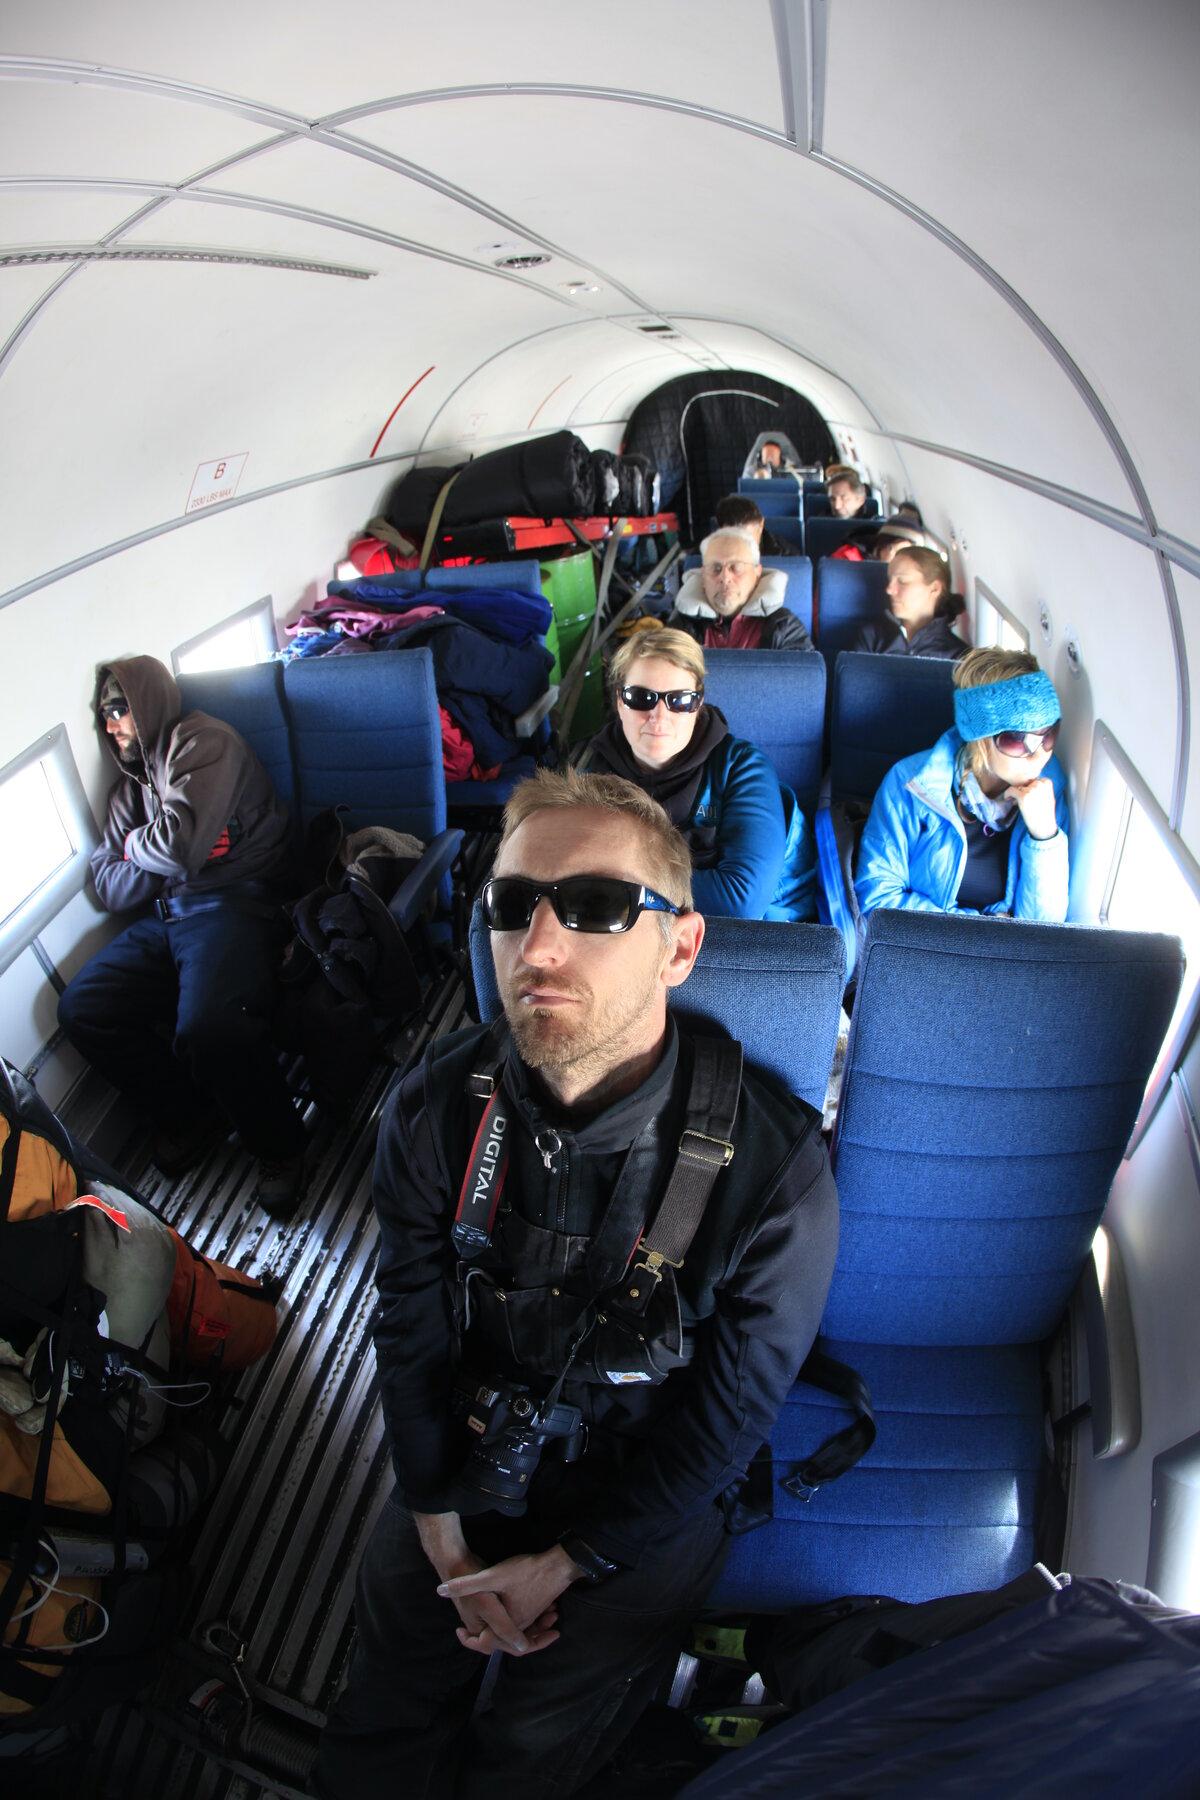 Guests en route to the South Pole via Basler BT-67